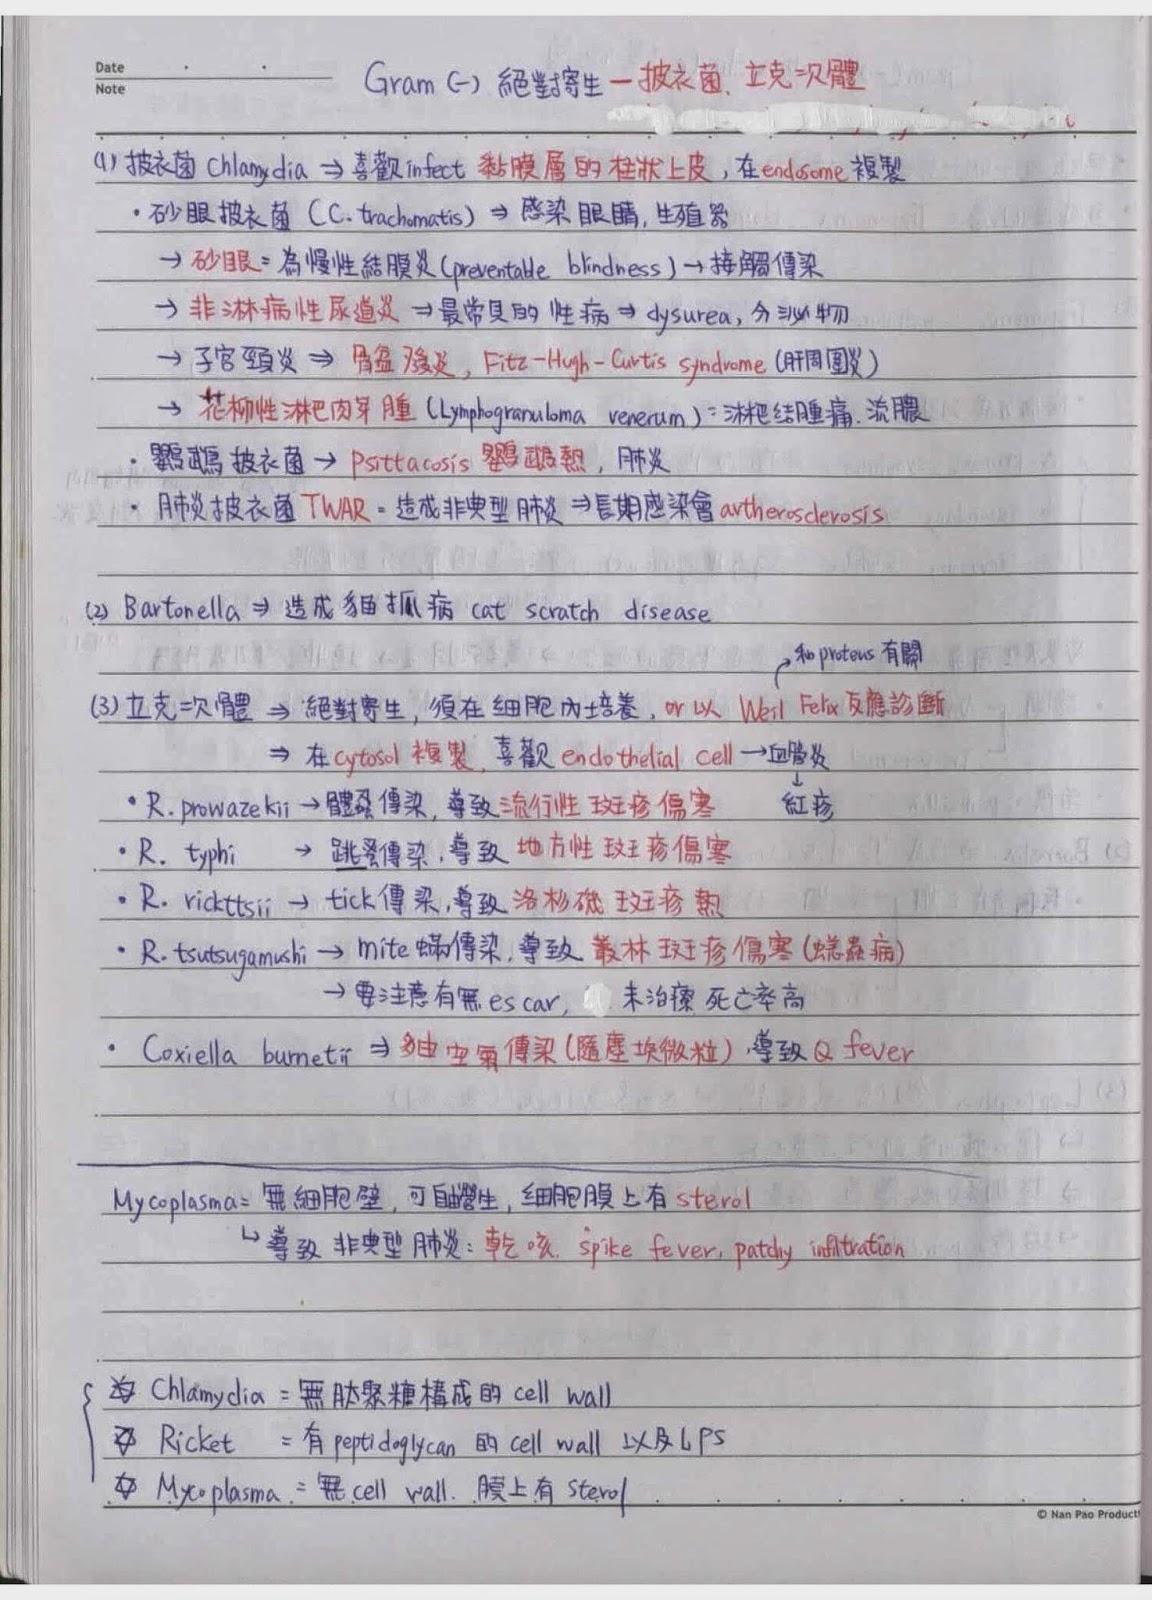 TINY Notes: tiny醫師一階國考筆記_細菌08_絕對寄生菌與黴漿菌